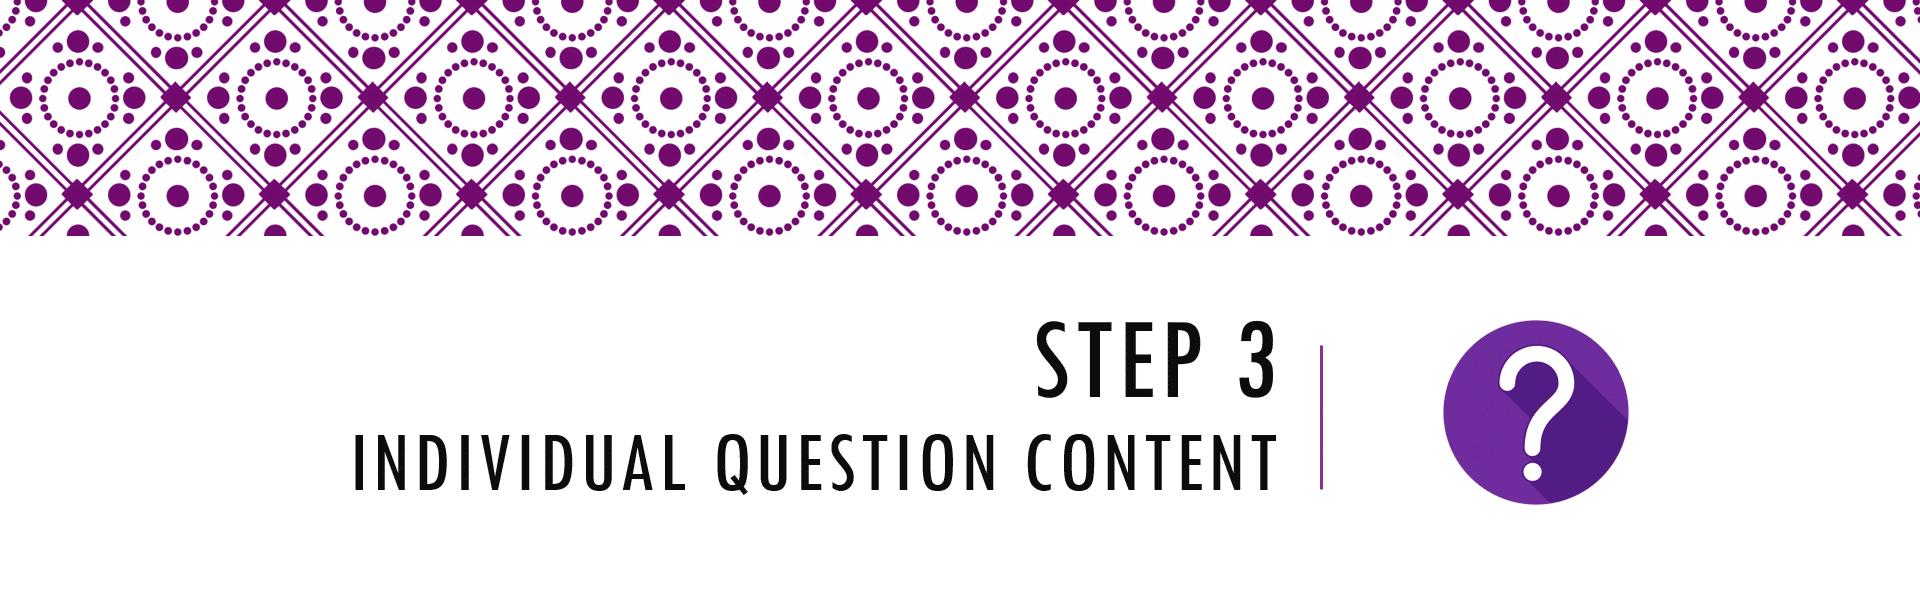 Questionnaire Design Process Step 3- Individual Question Content